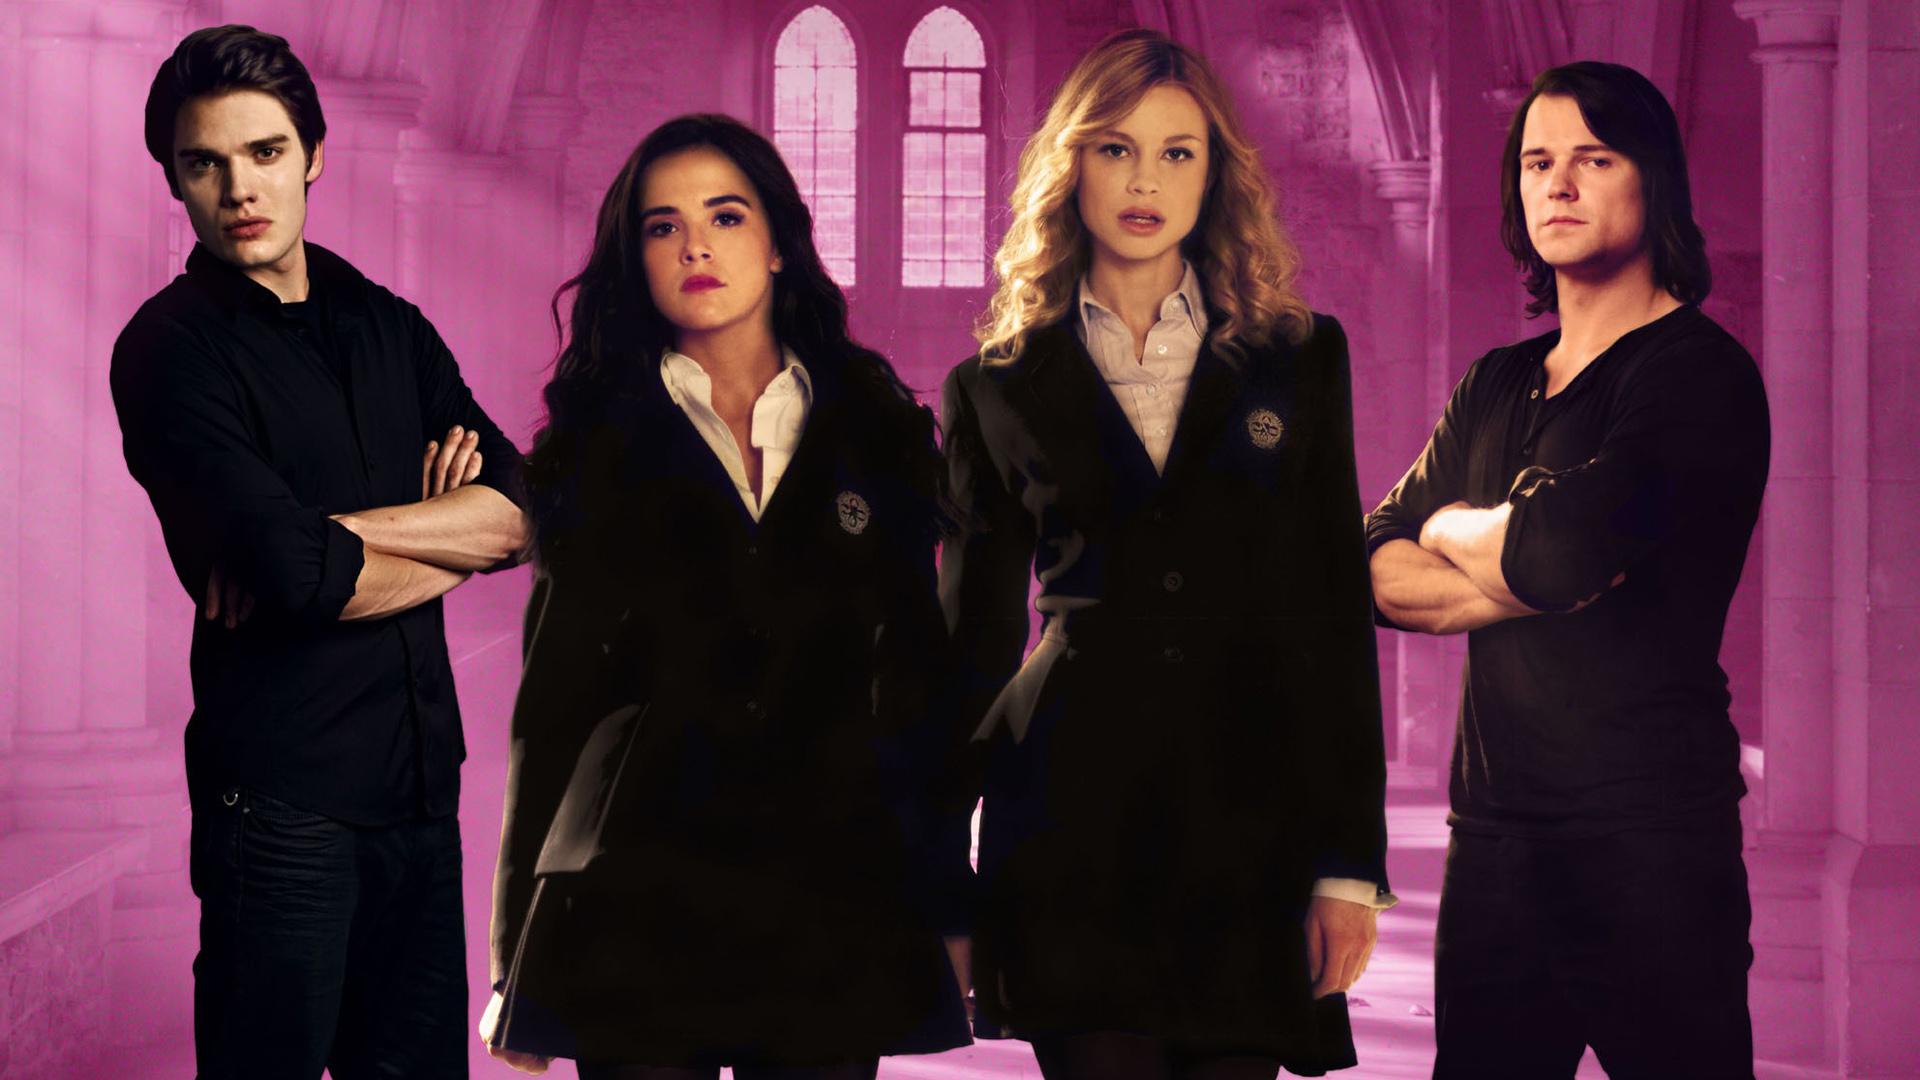 Vampire Academy: Blood Sisters | Movie fanart | fanart.tv Danila Kozlovsky Vampire Academy